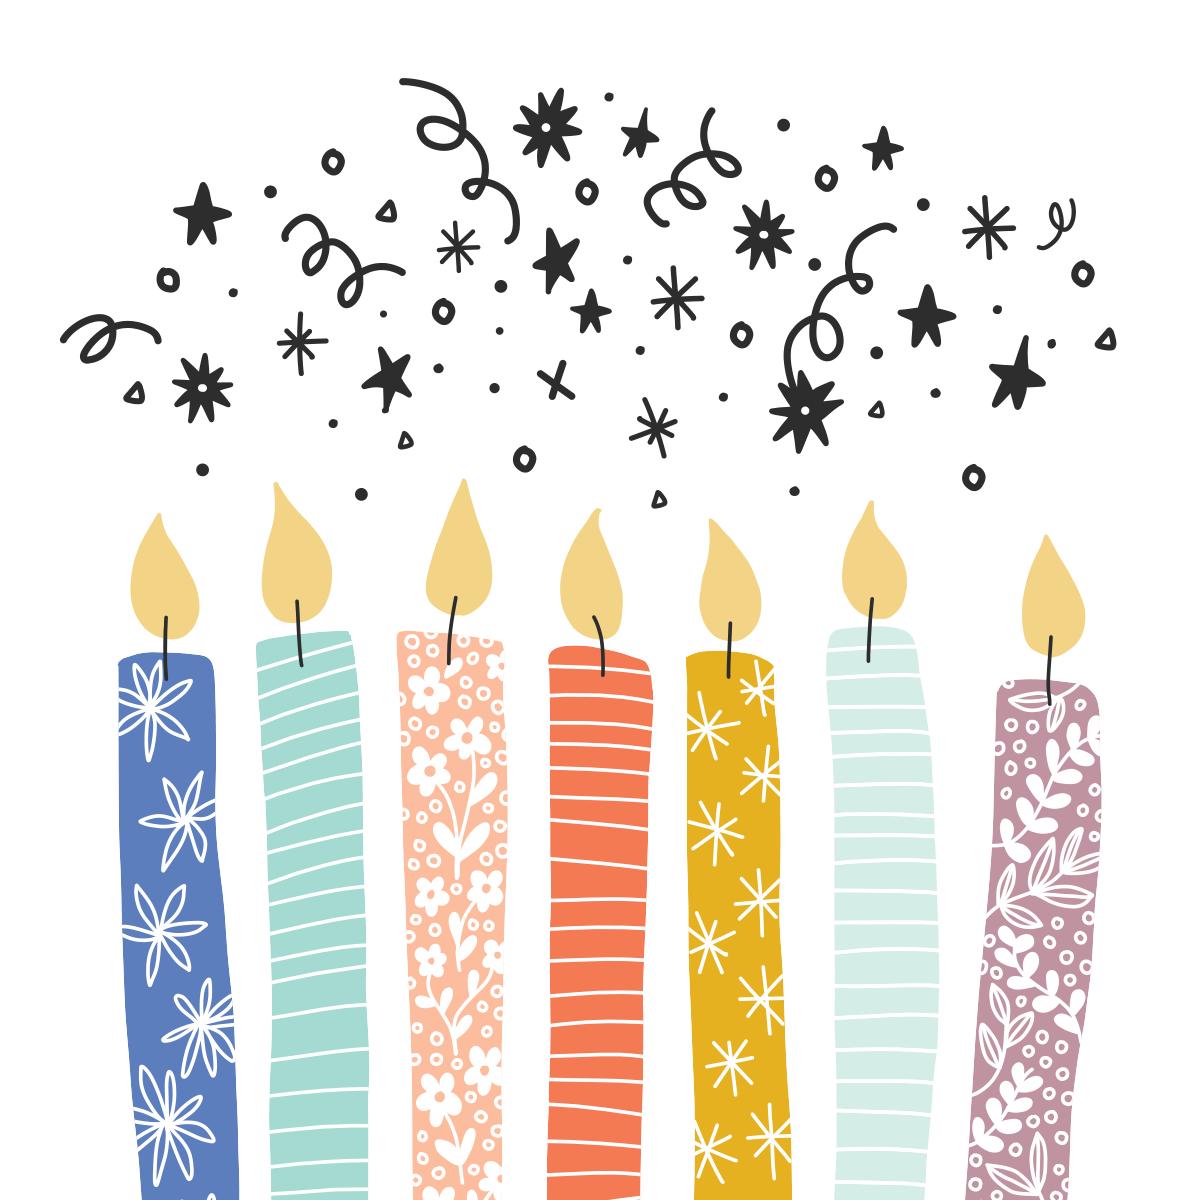 Day5-BirthdayCandles-insta2.png